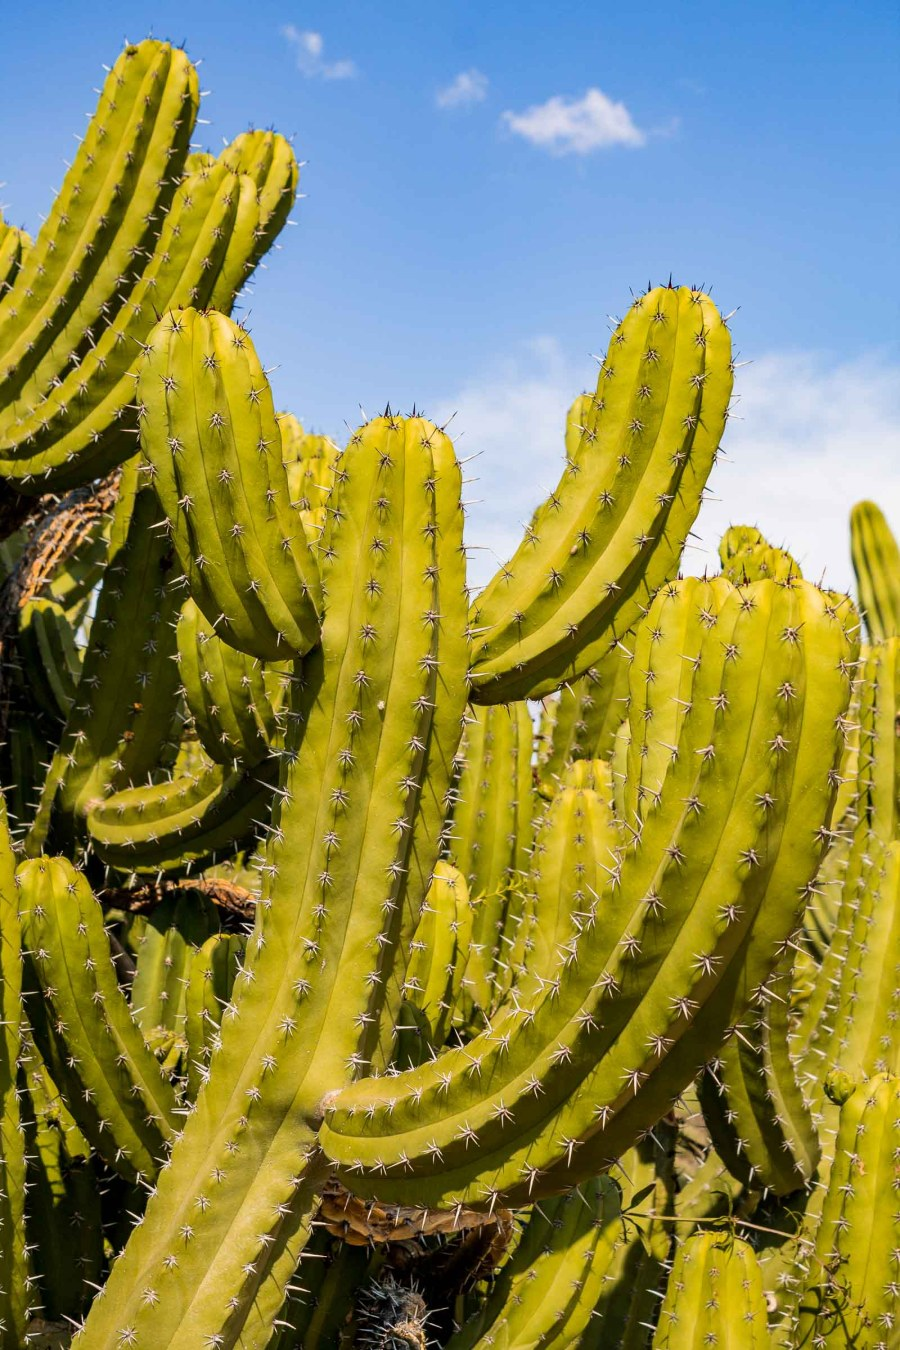 Sharp cacti at Botanicactus in Mallorca